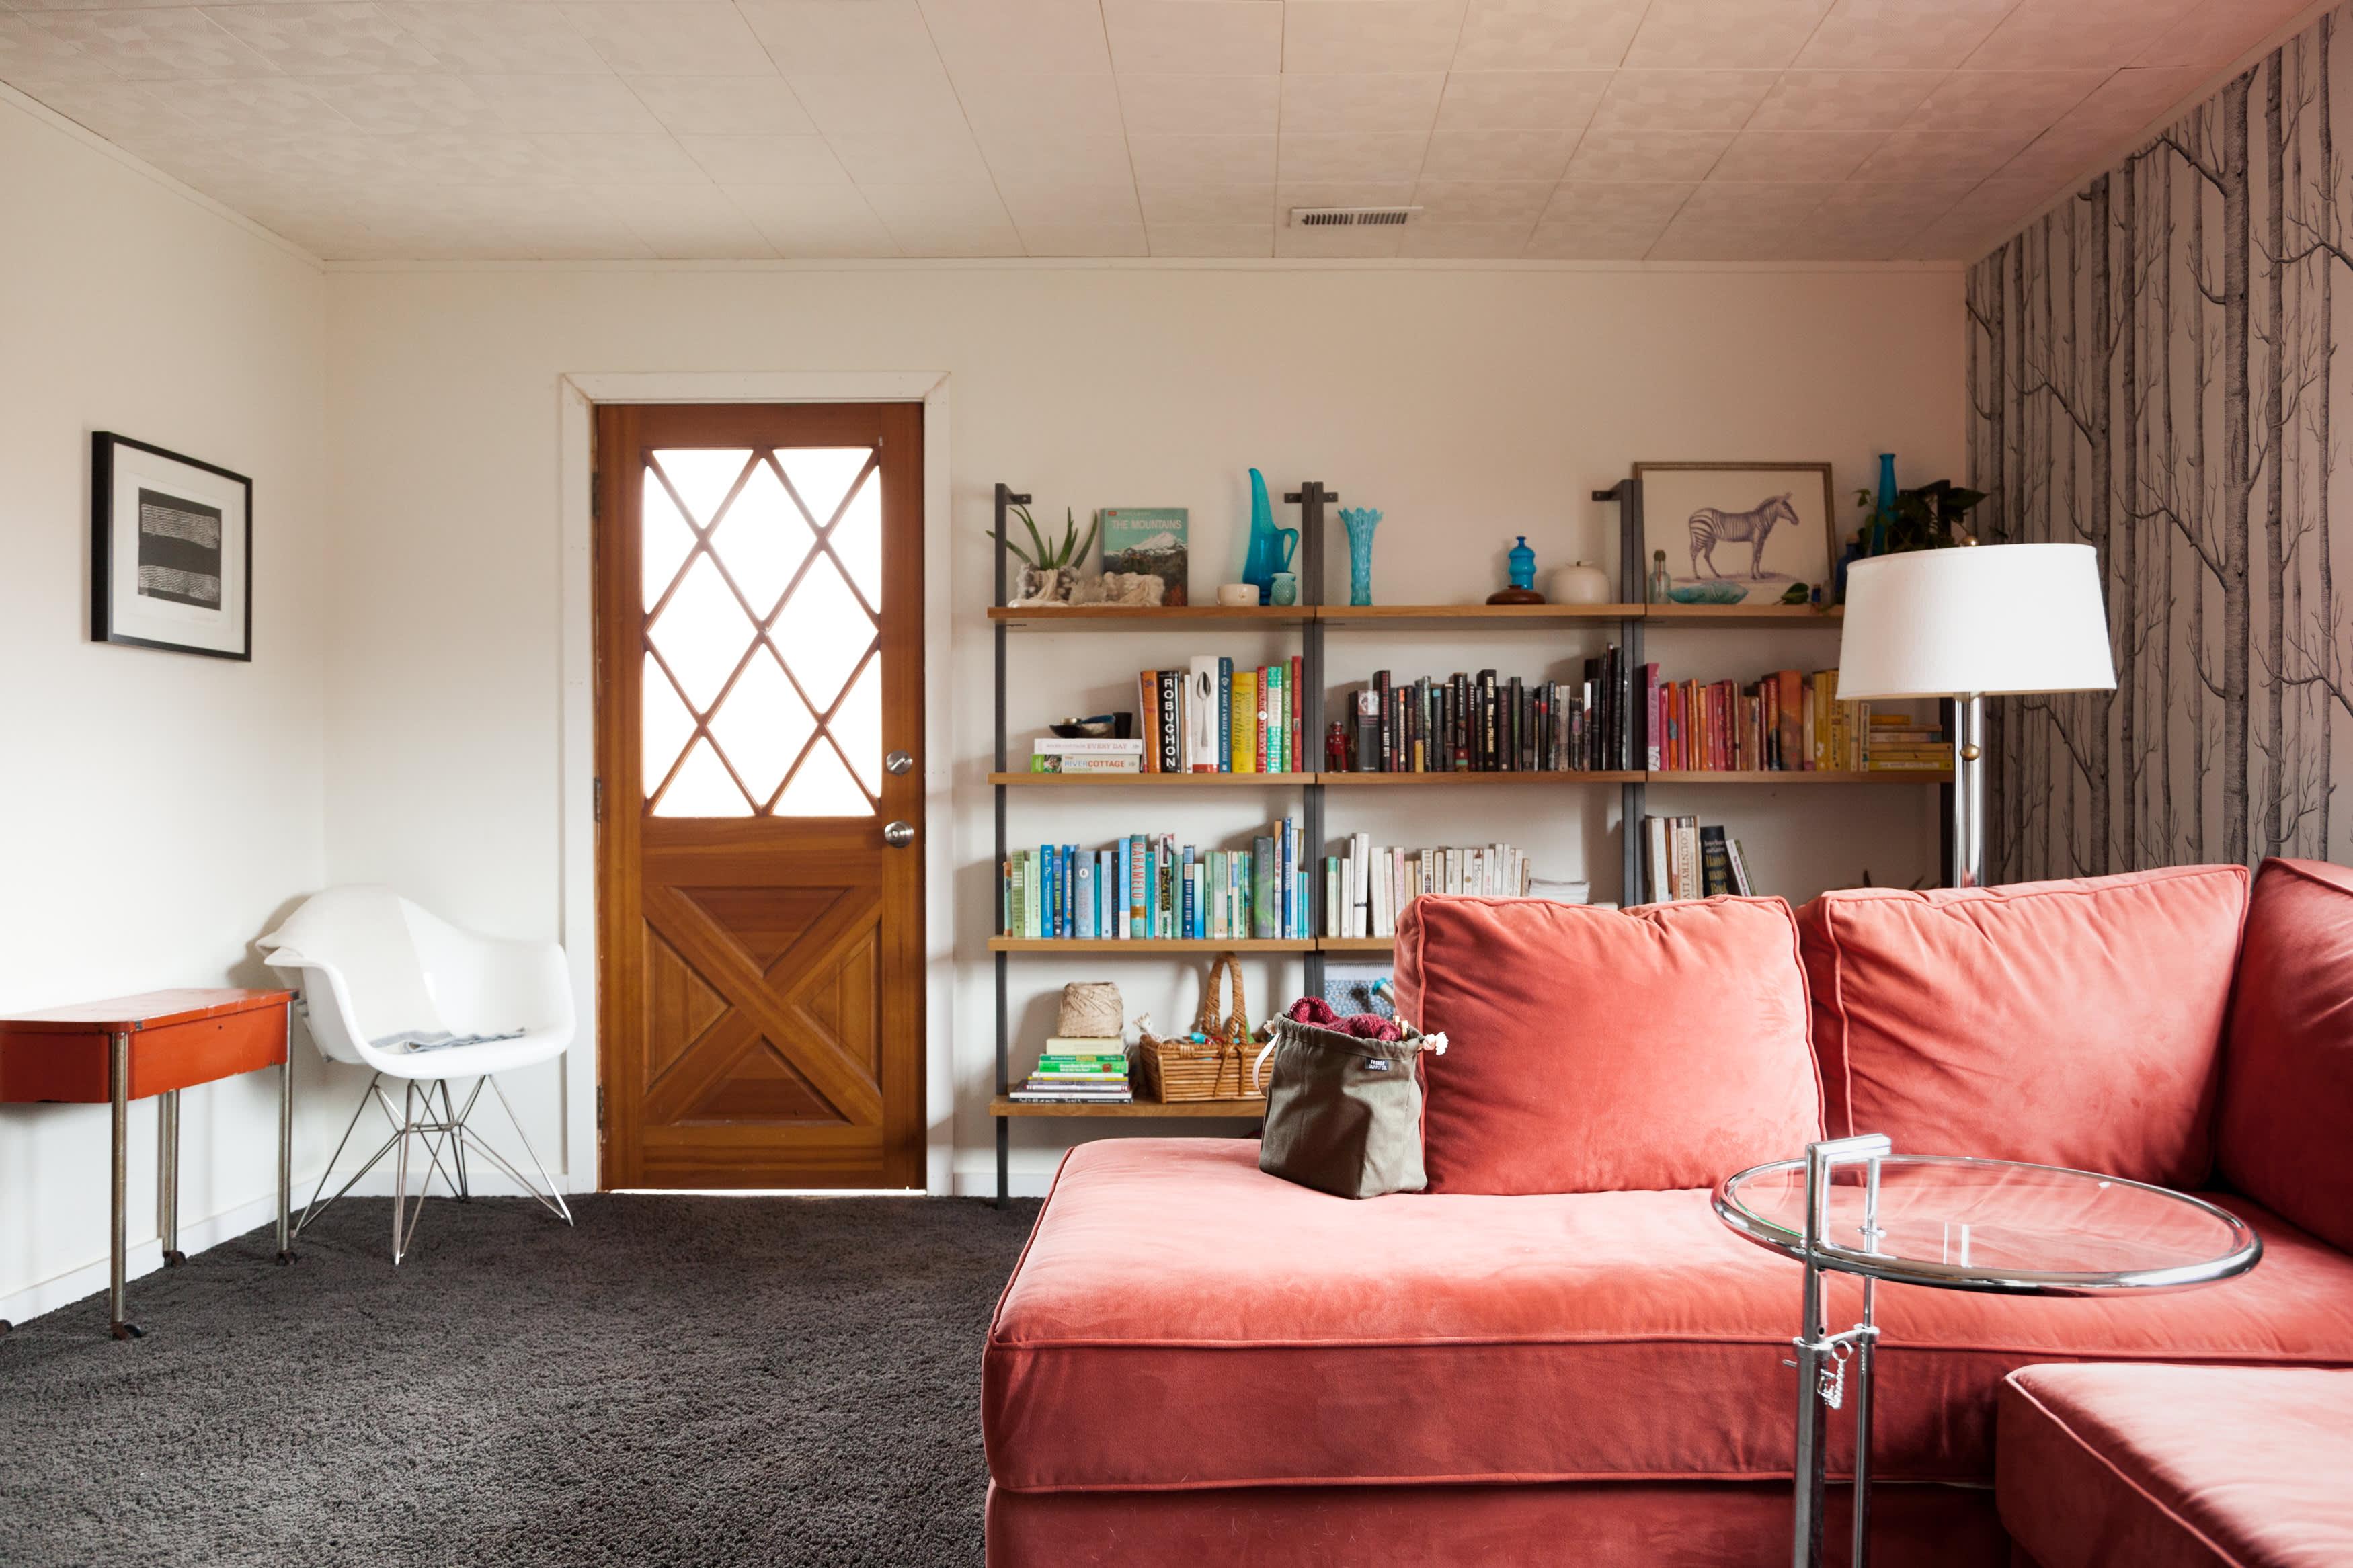 House Tour: A Cozy Portland House & Jewelry Studio ...